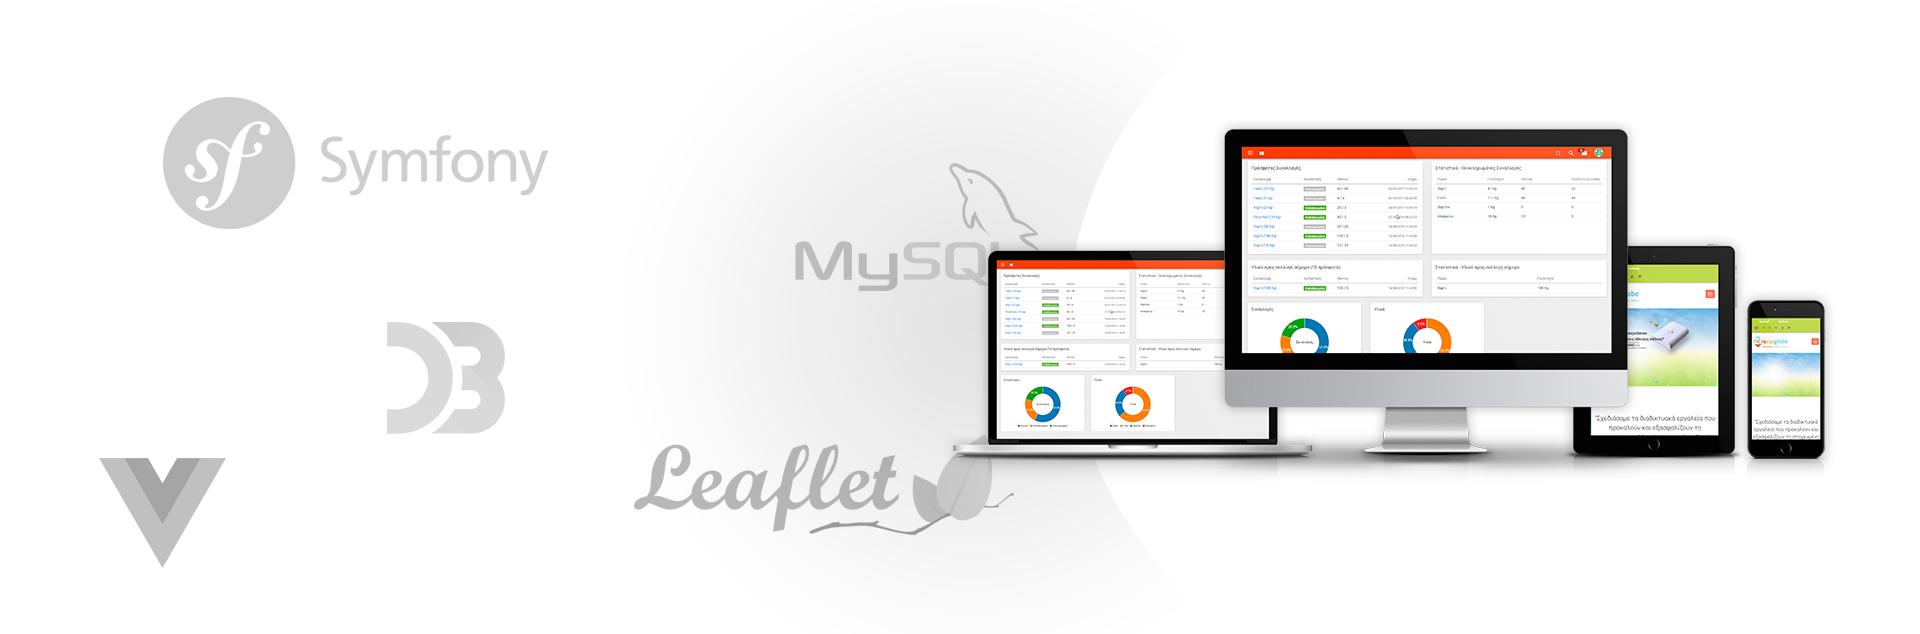 recycglobe responsive platform design - Software product development